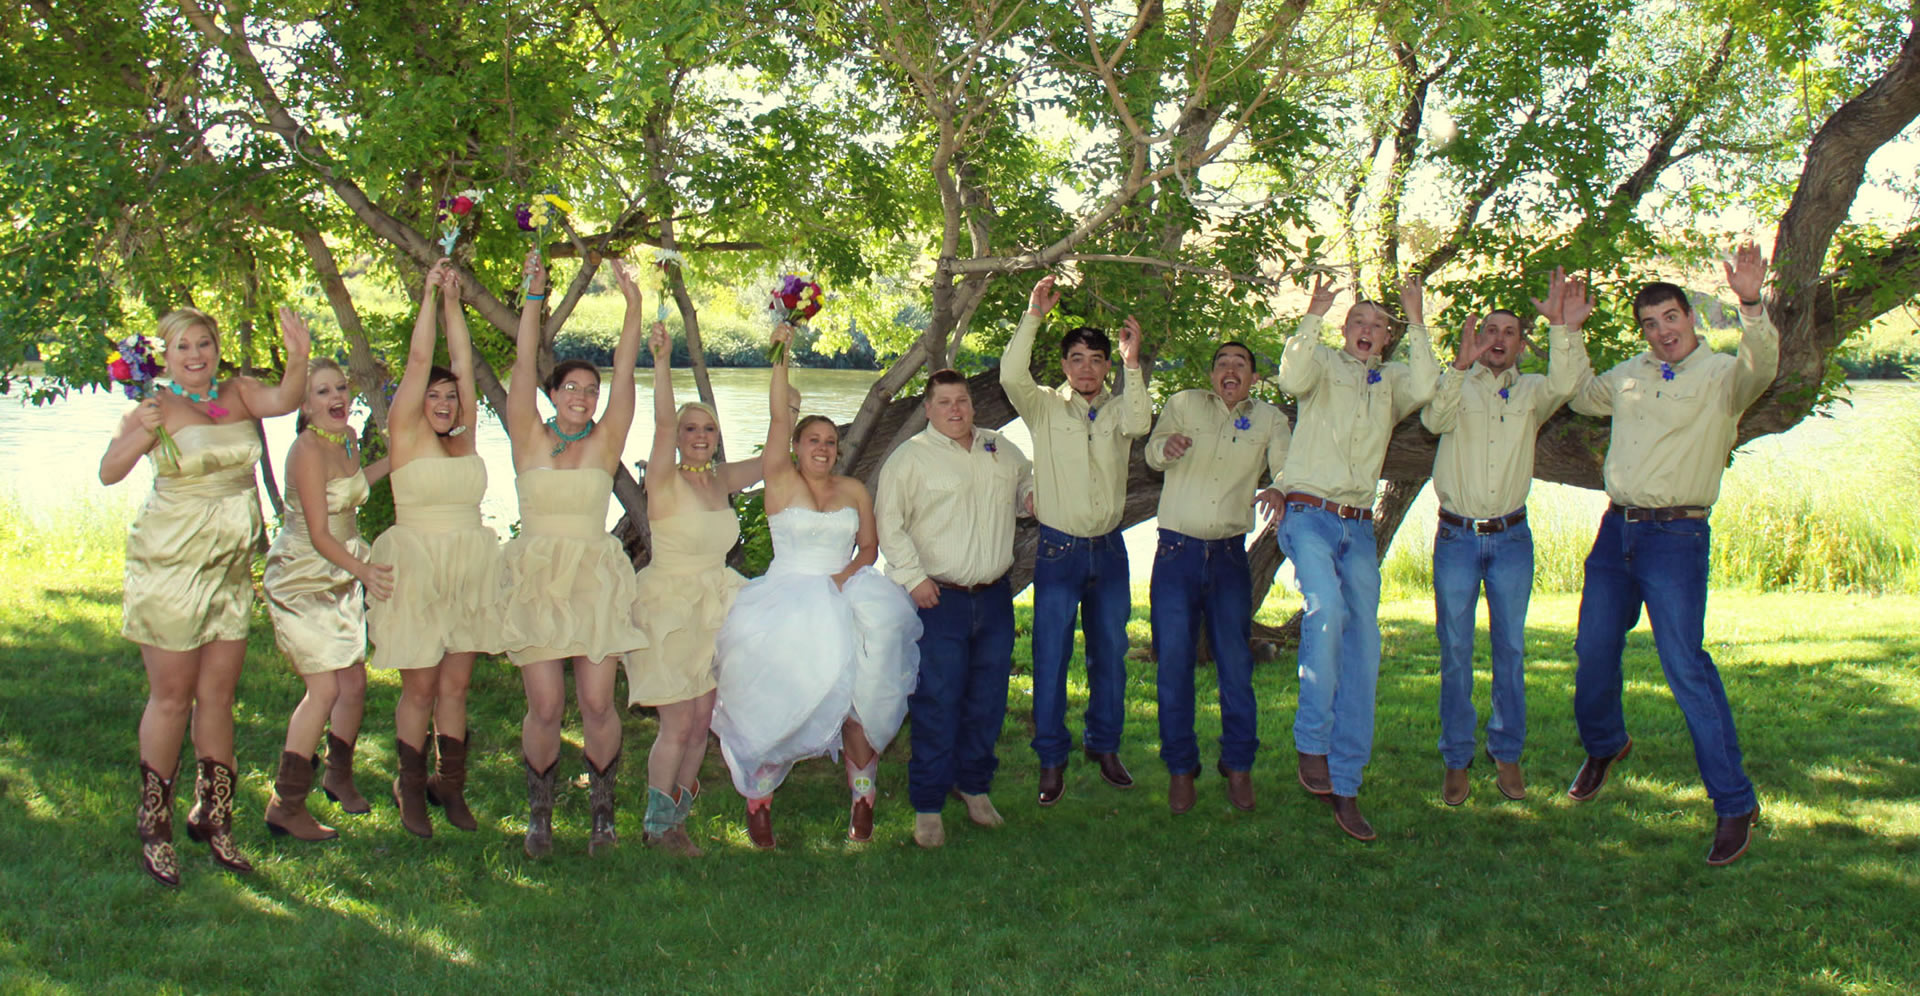 Outdoor Wedding Venue Casper Wyoming